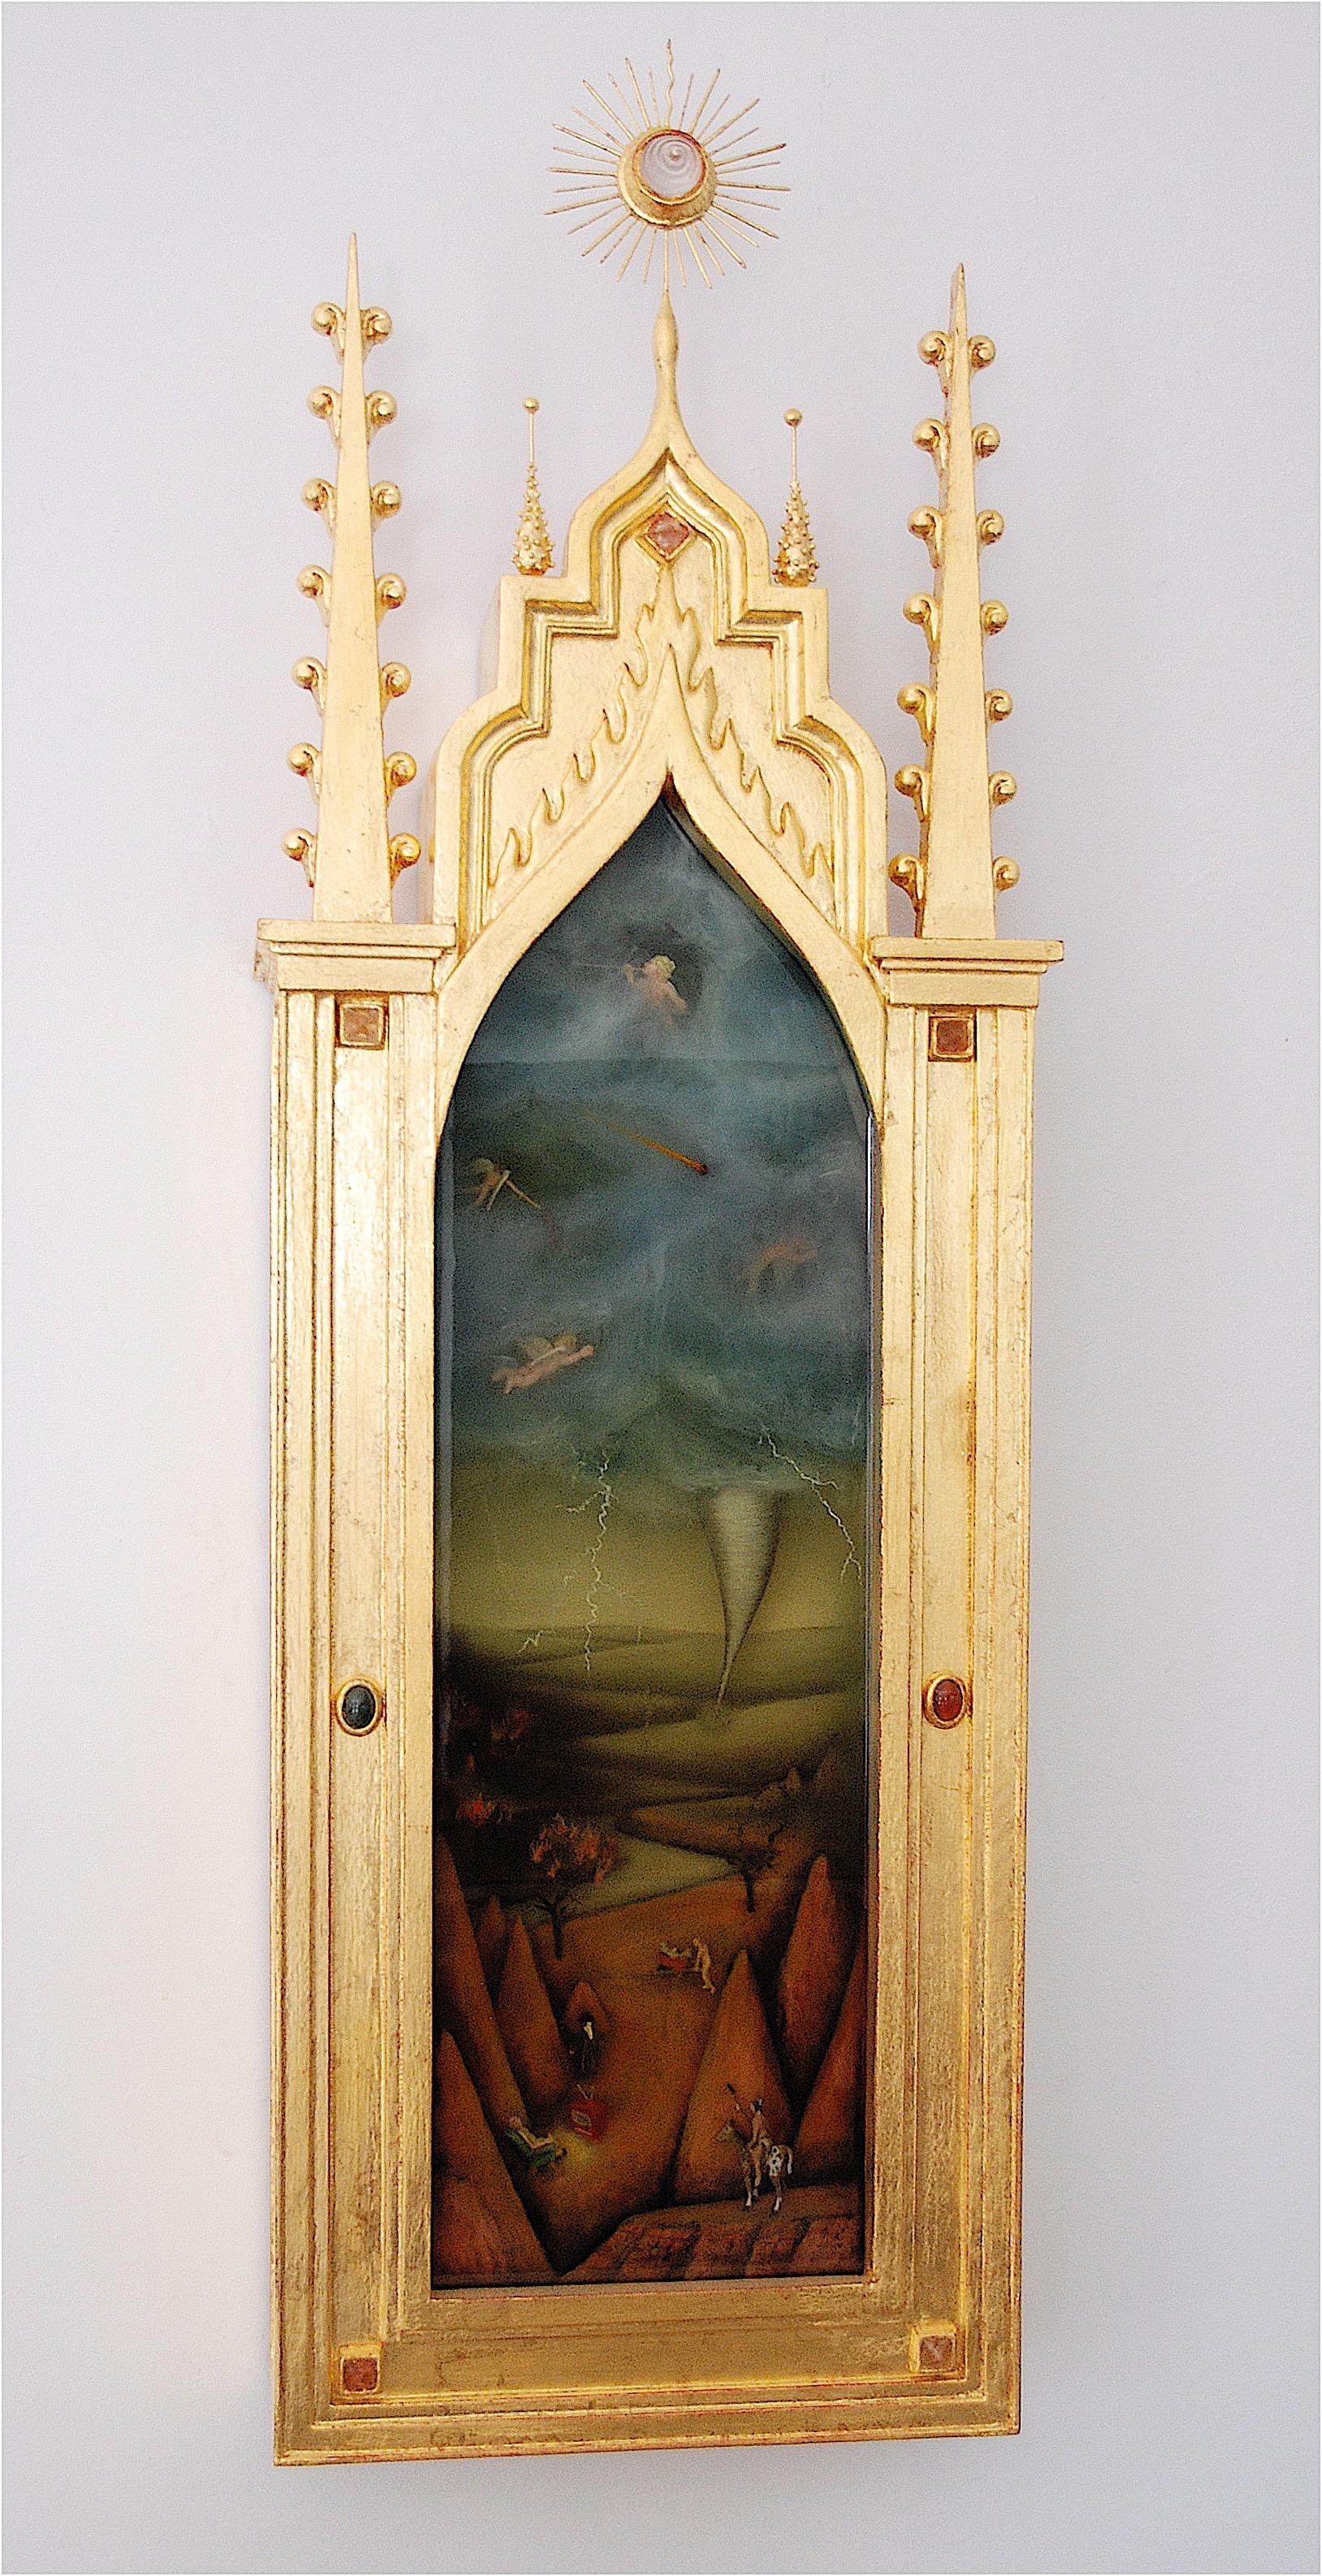 "Thomas Coffin - Bad Reception Again, 42""h x 12""w x 5""d, mixed media 3-d diorama encased in acrylic resin, handmade wood frame, 23 kt. gold leaf"